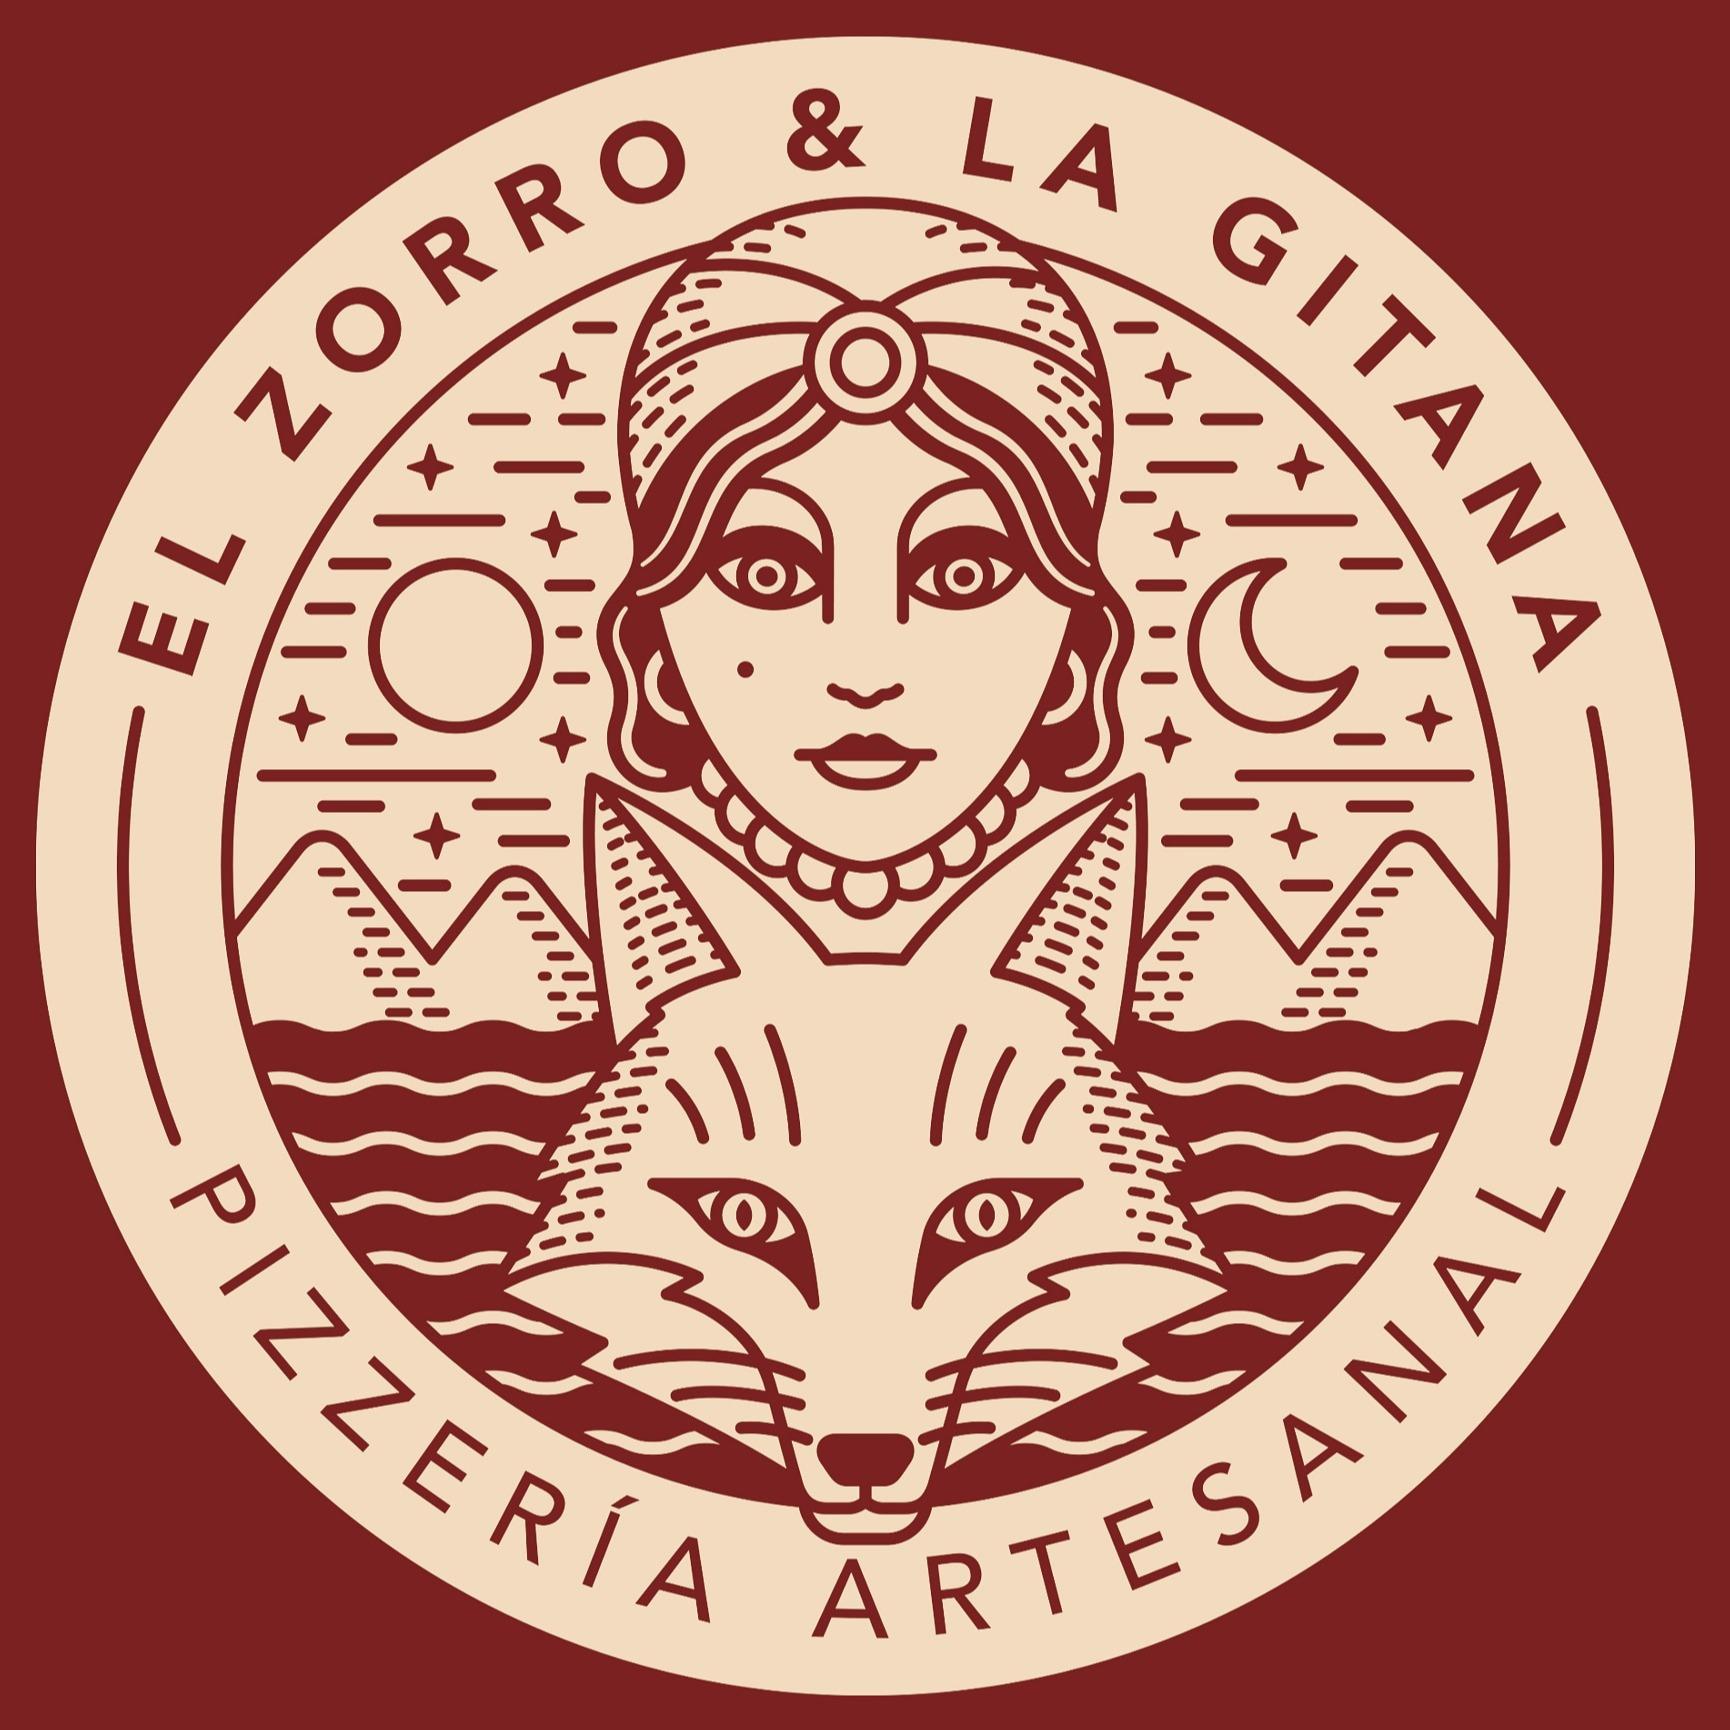 @elzorroylagitana Profile Image | Linktree